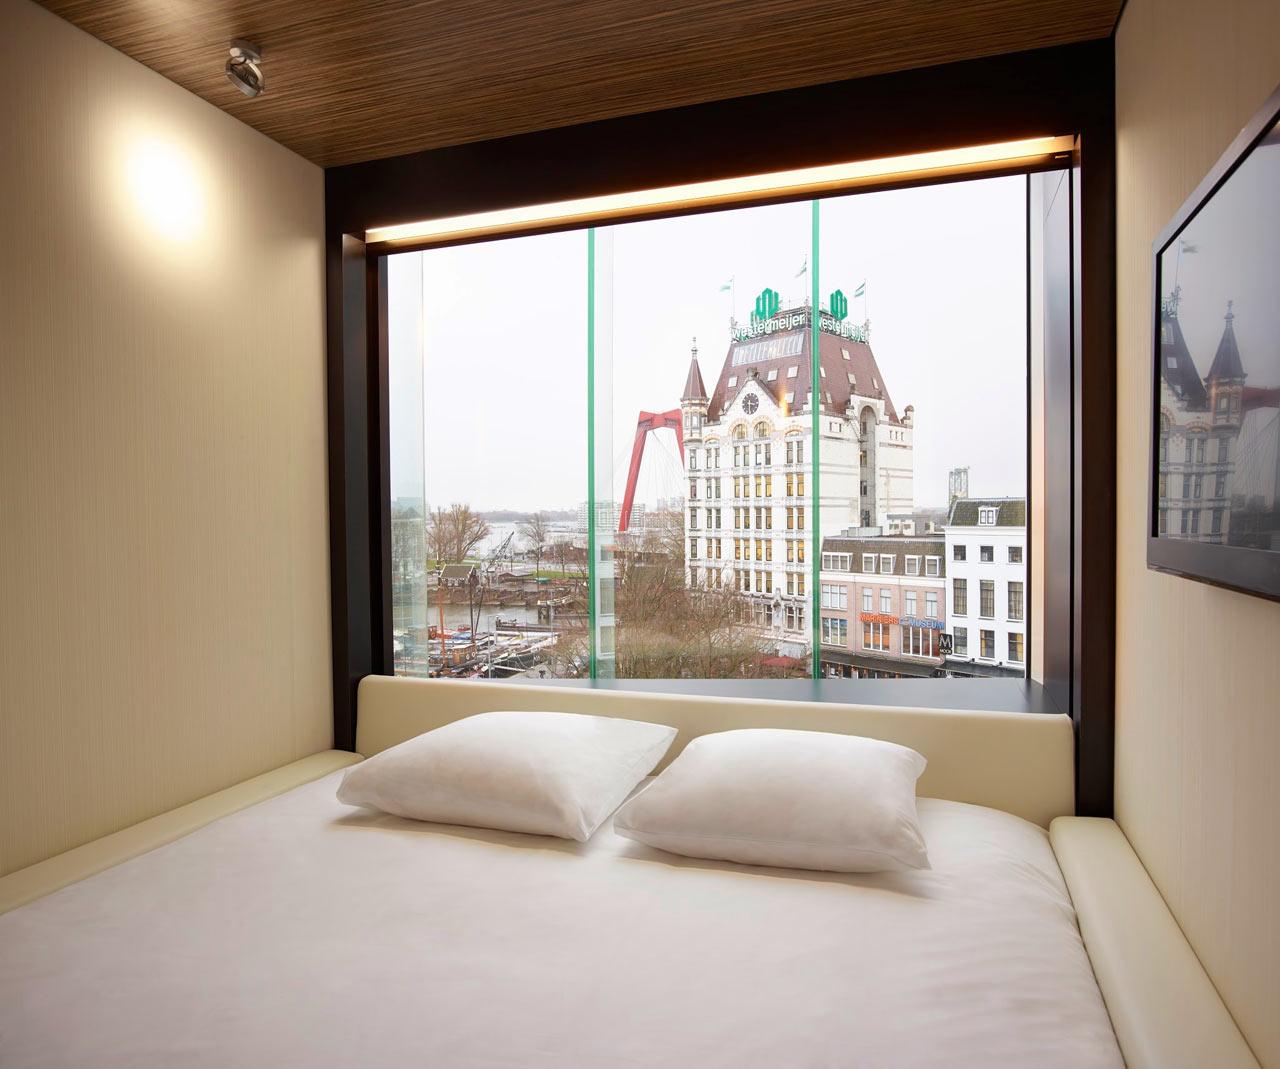 Destin-citizenM_Rotterdam-hotel-17